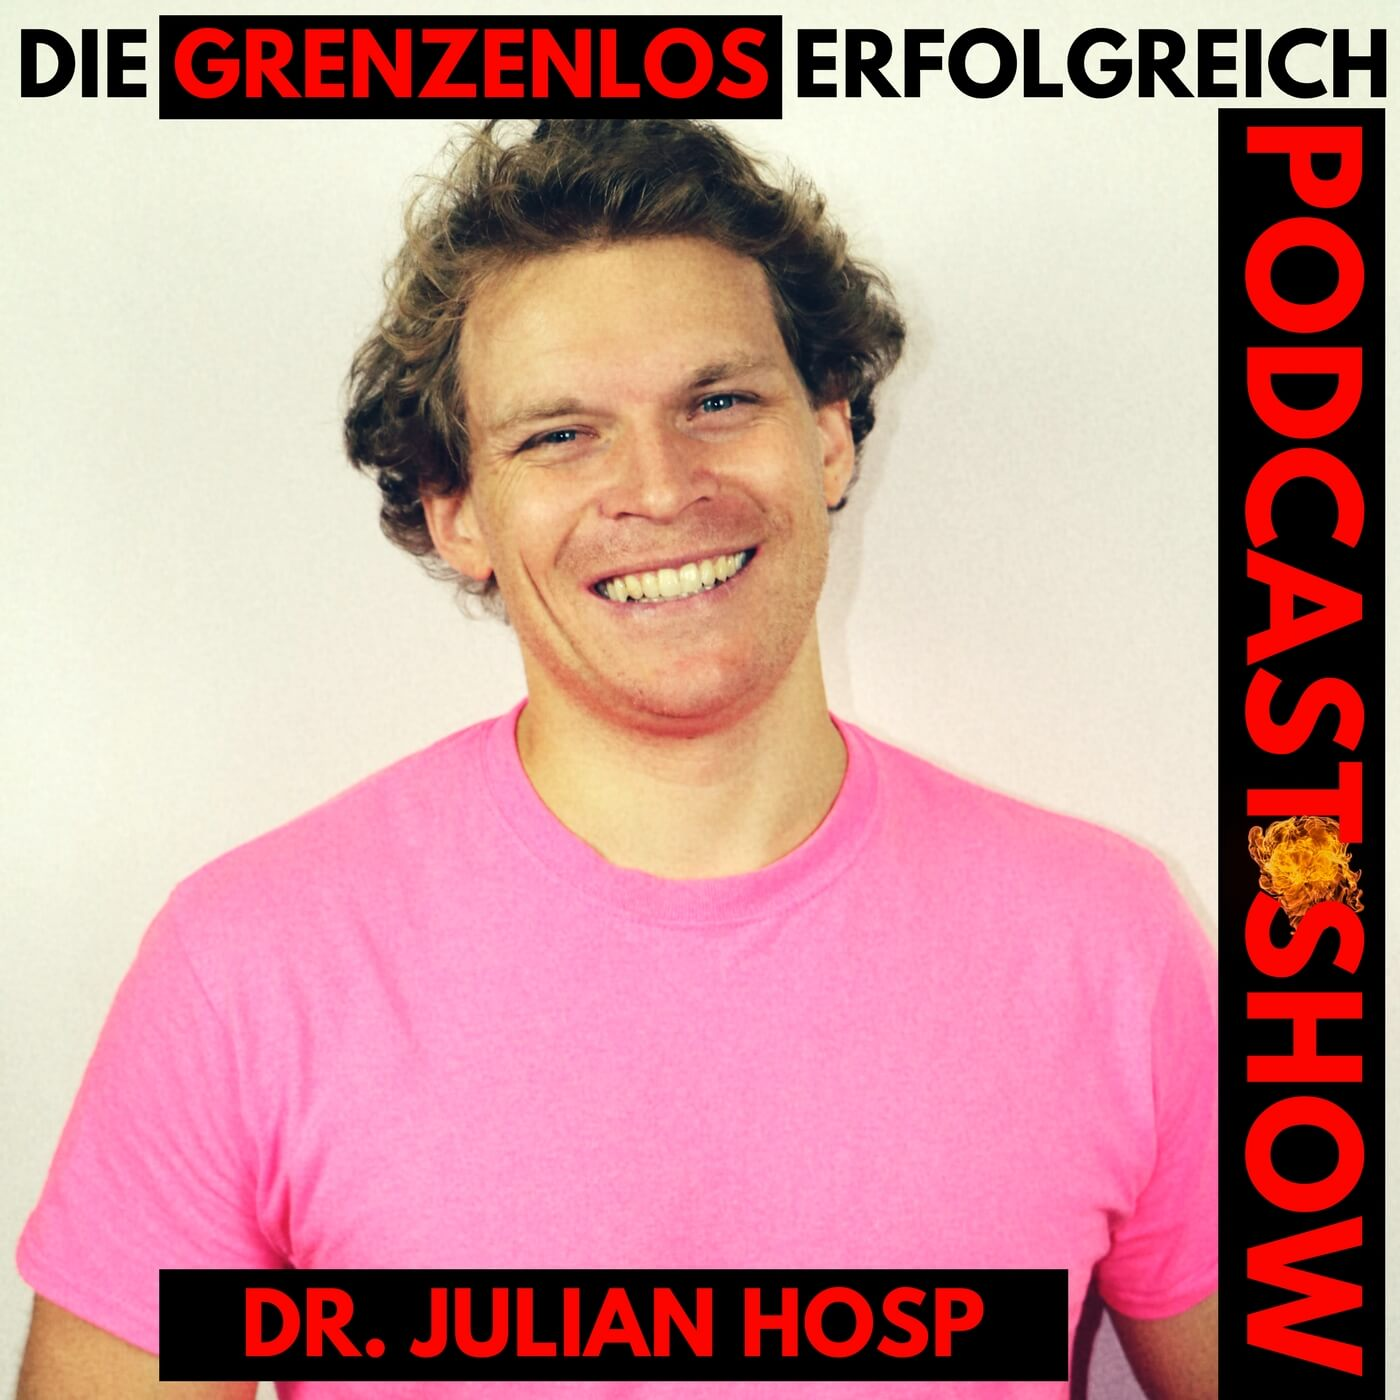 Dr. Julian Hosp